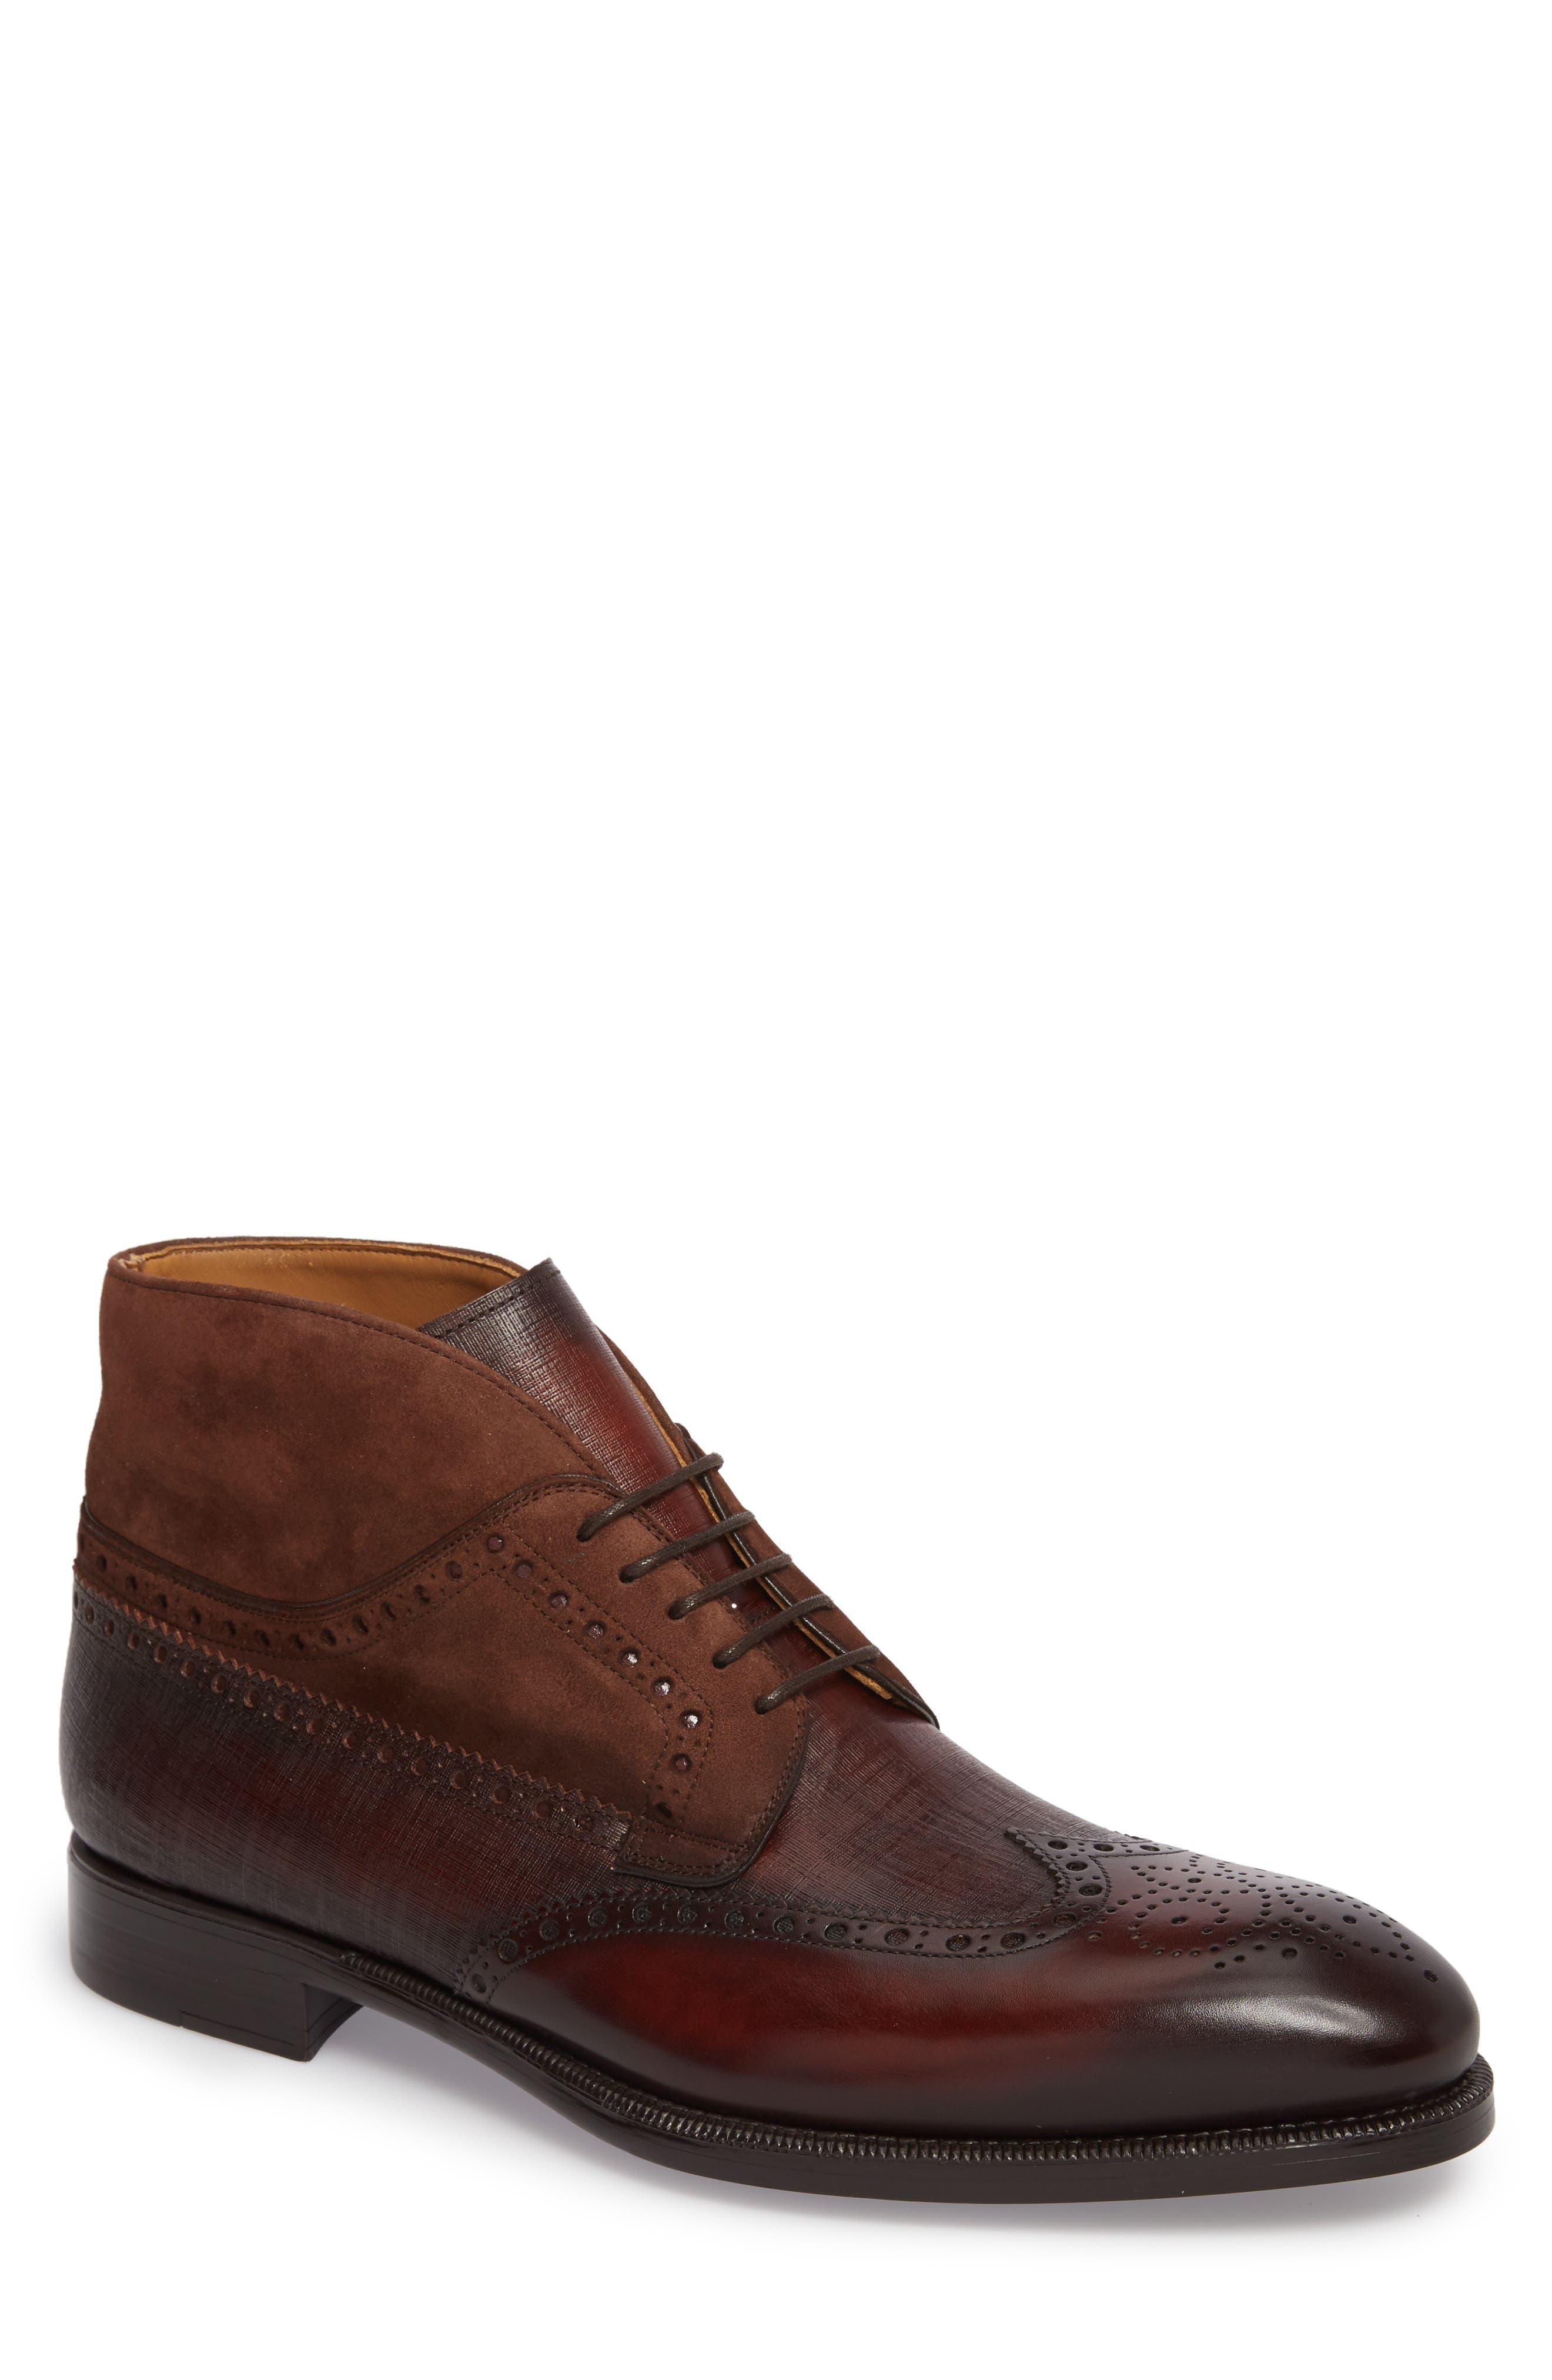 Saxon Wingtip Boot,                         Main,                         color,